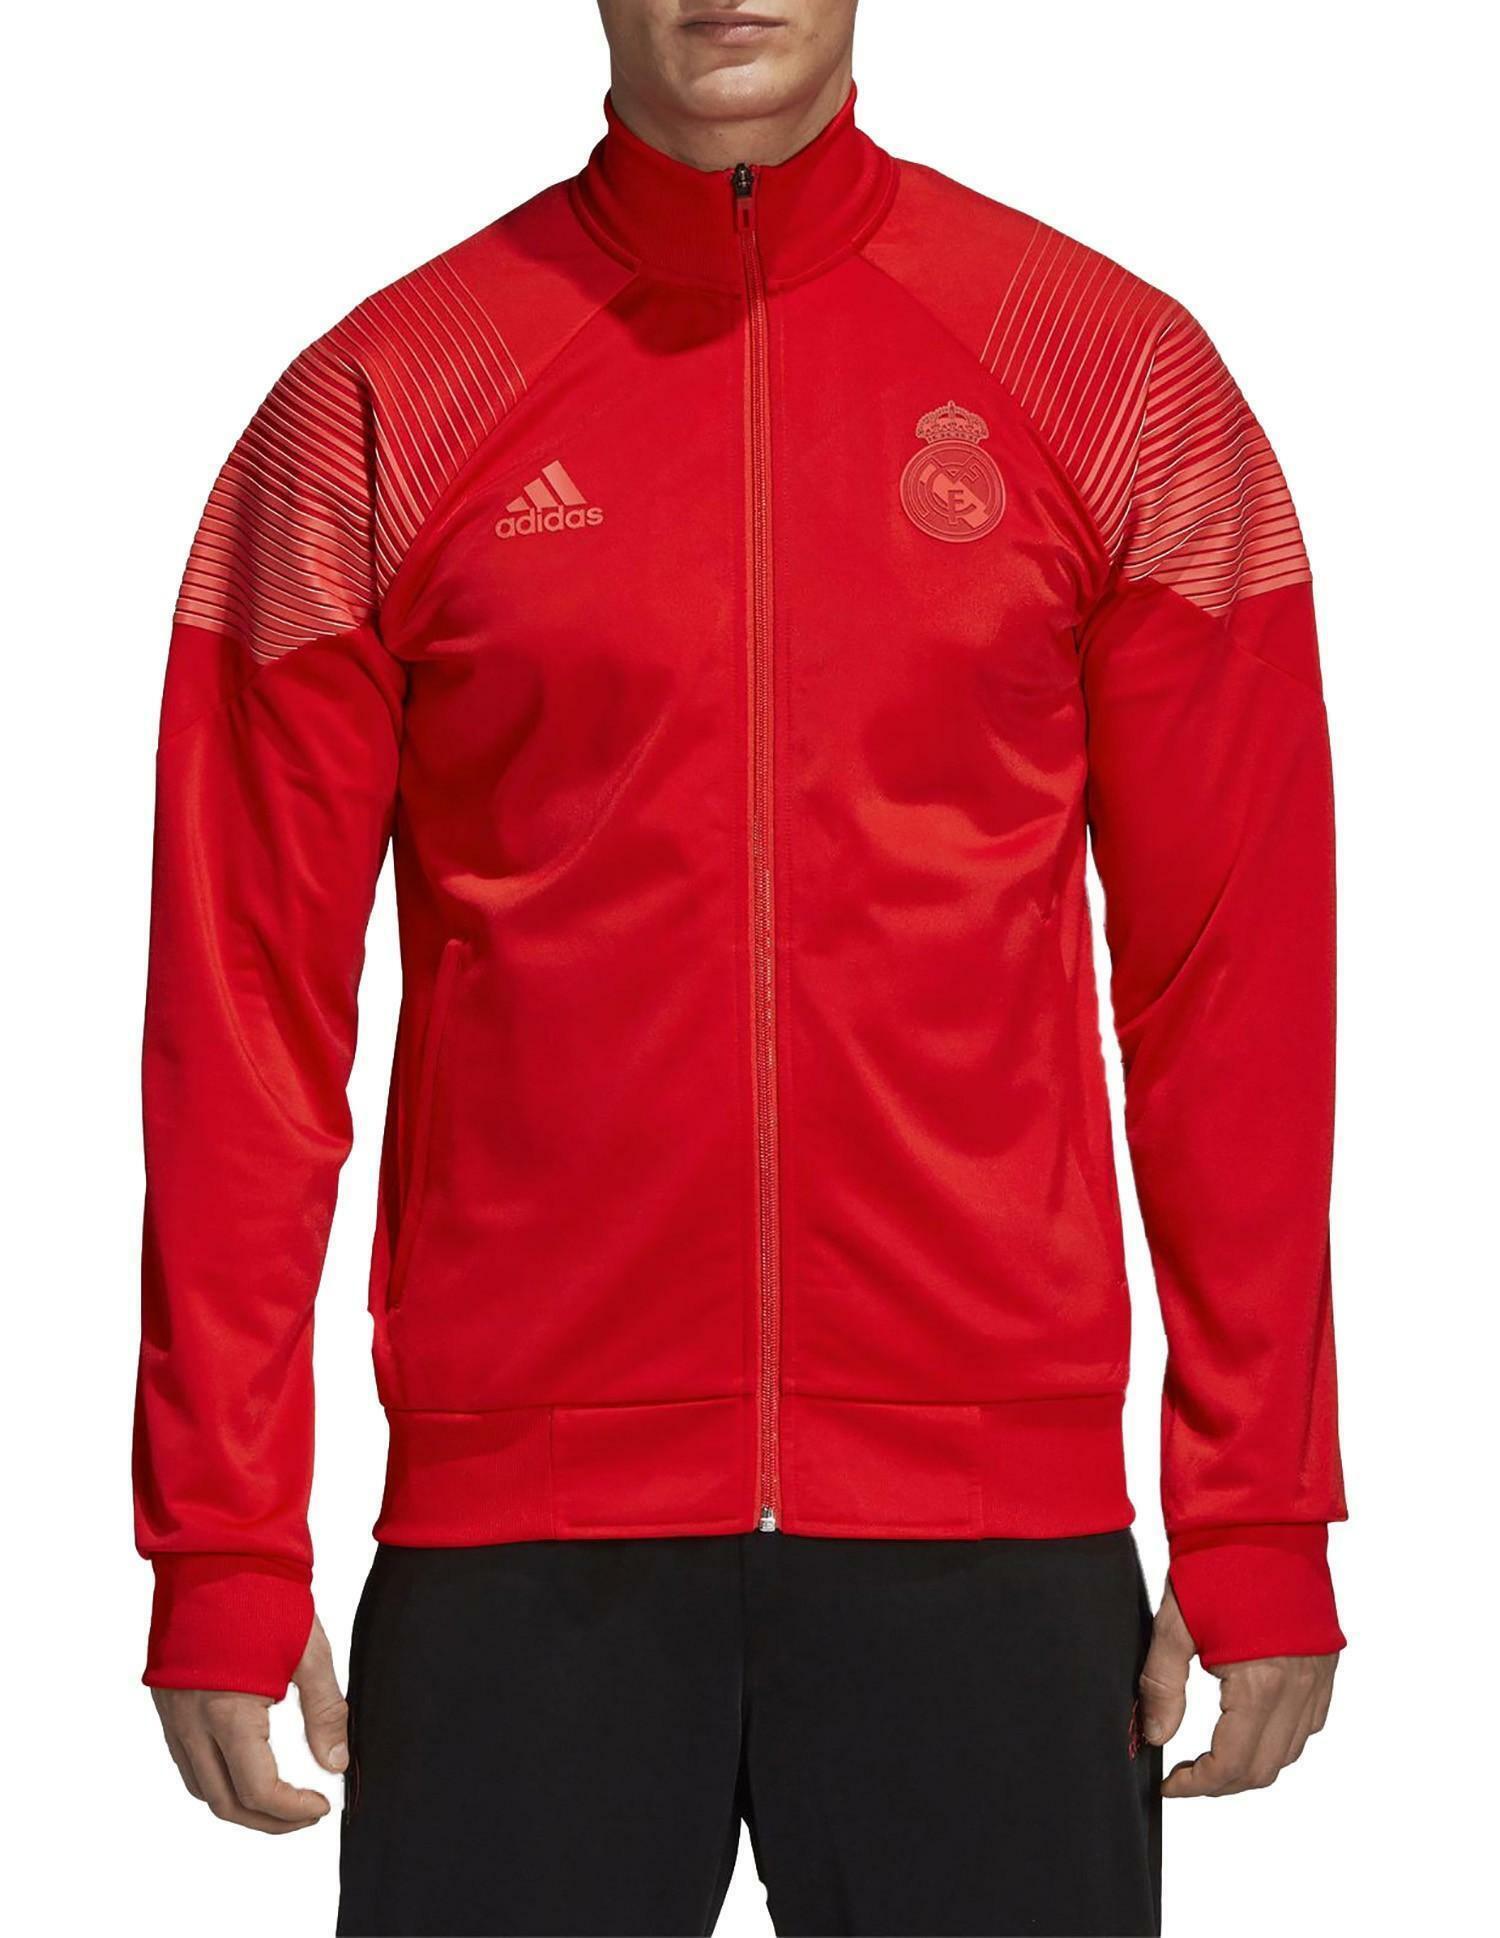 adidas adidas giacchetto real madrid rosso uomo 2018/2019 cw8705